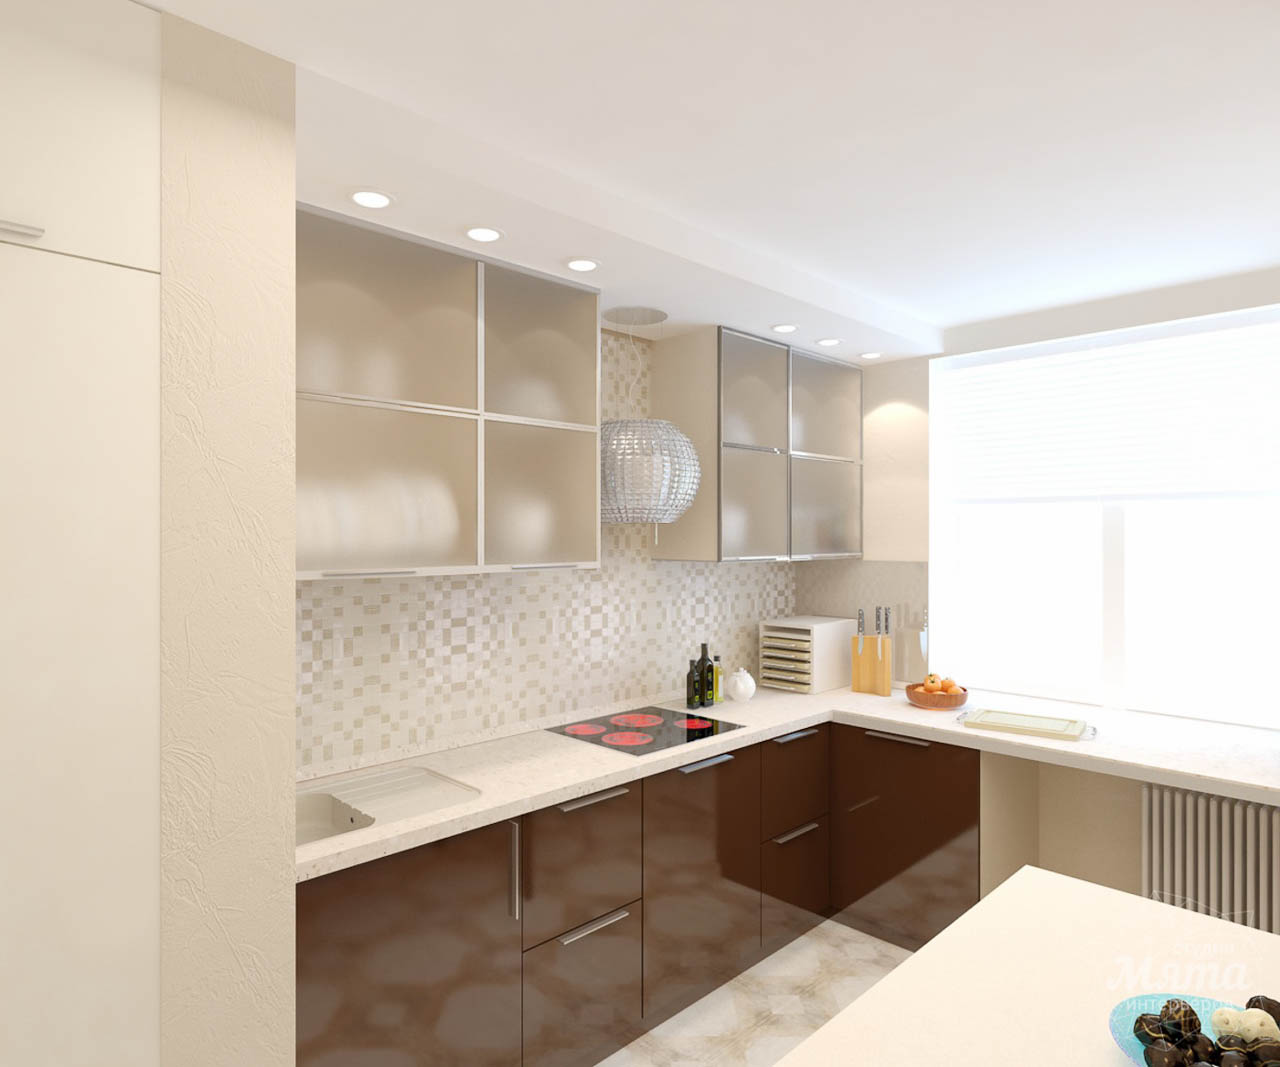 Дизайн интерьера и ремонт однокомнатной квартиры по ул. Бажова 134 img715000780